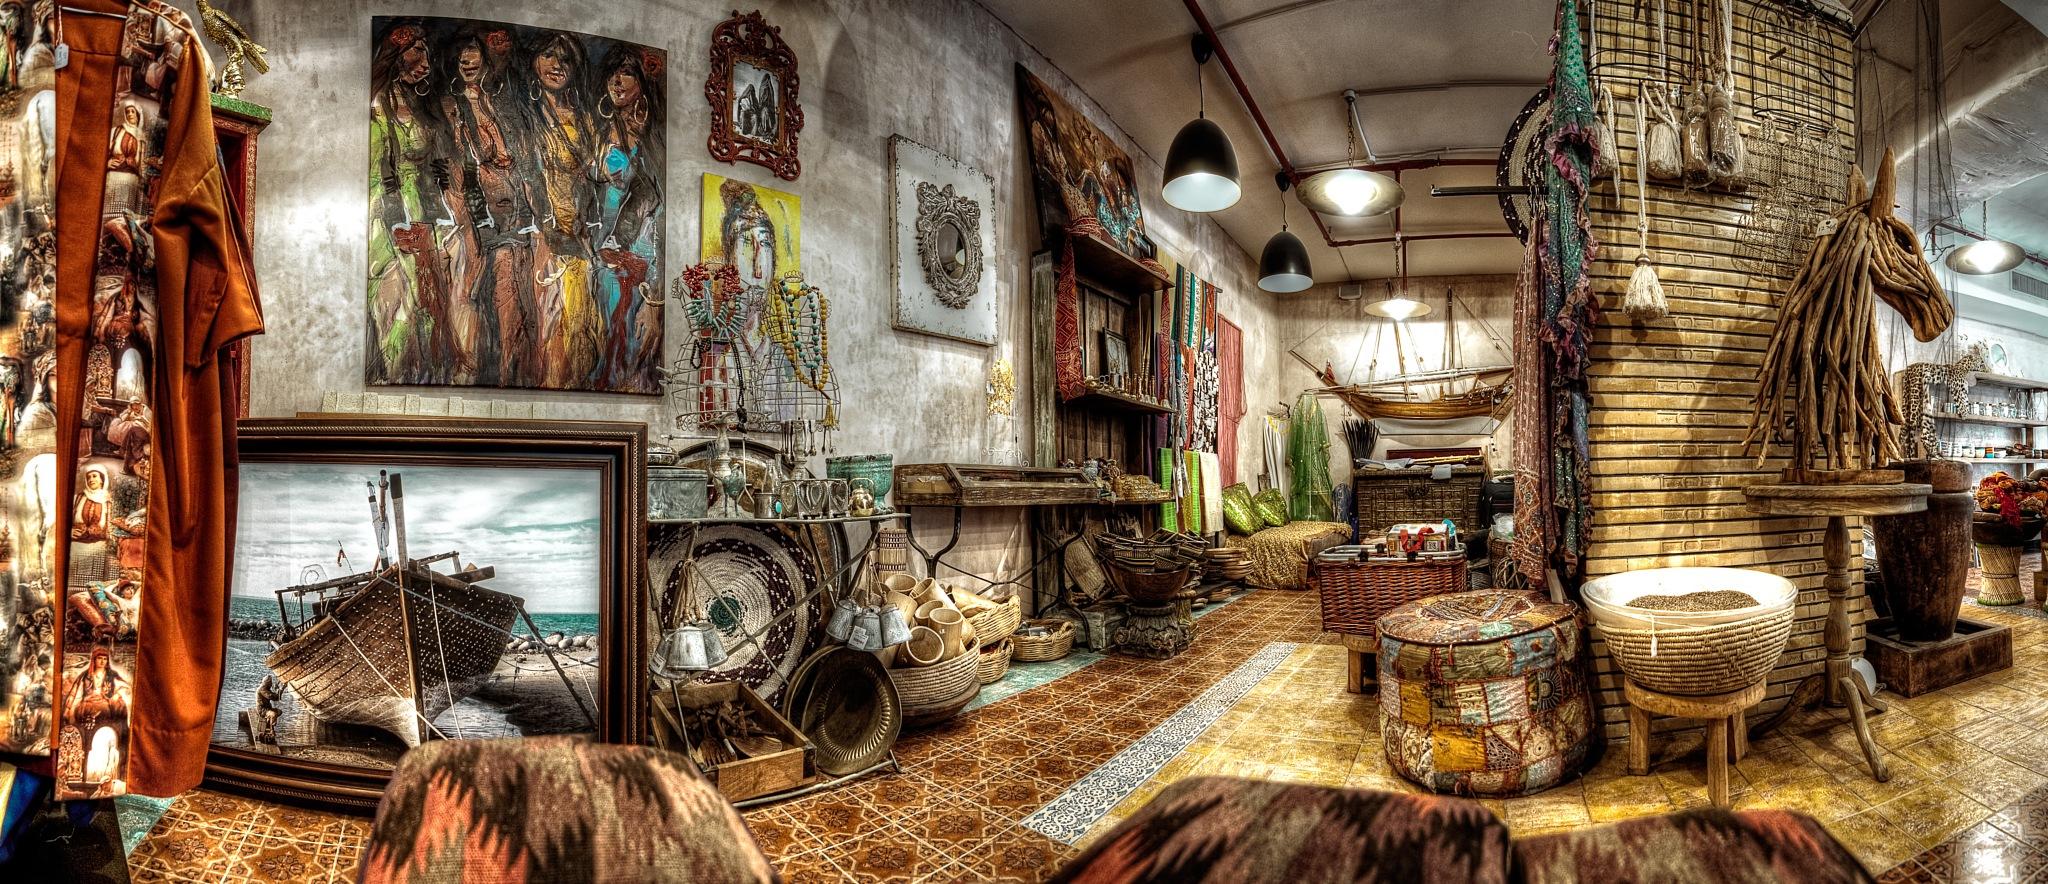 The House of Ahmed by Hisham Badran